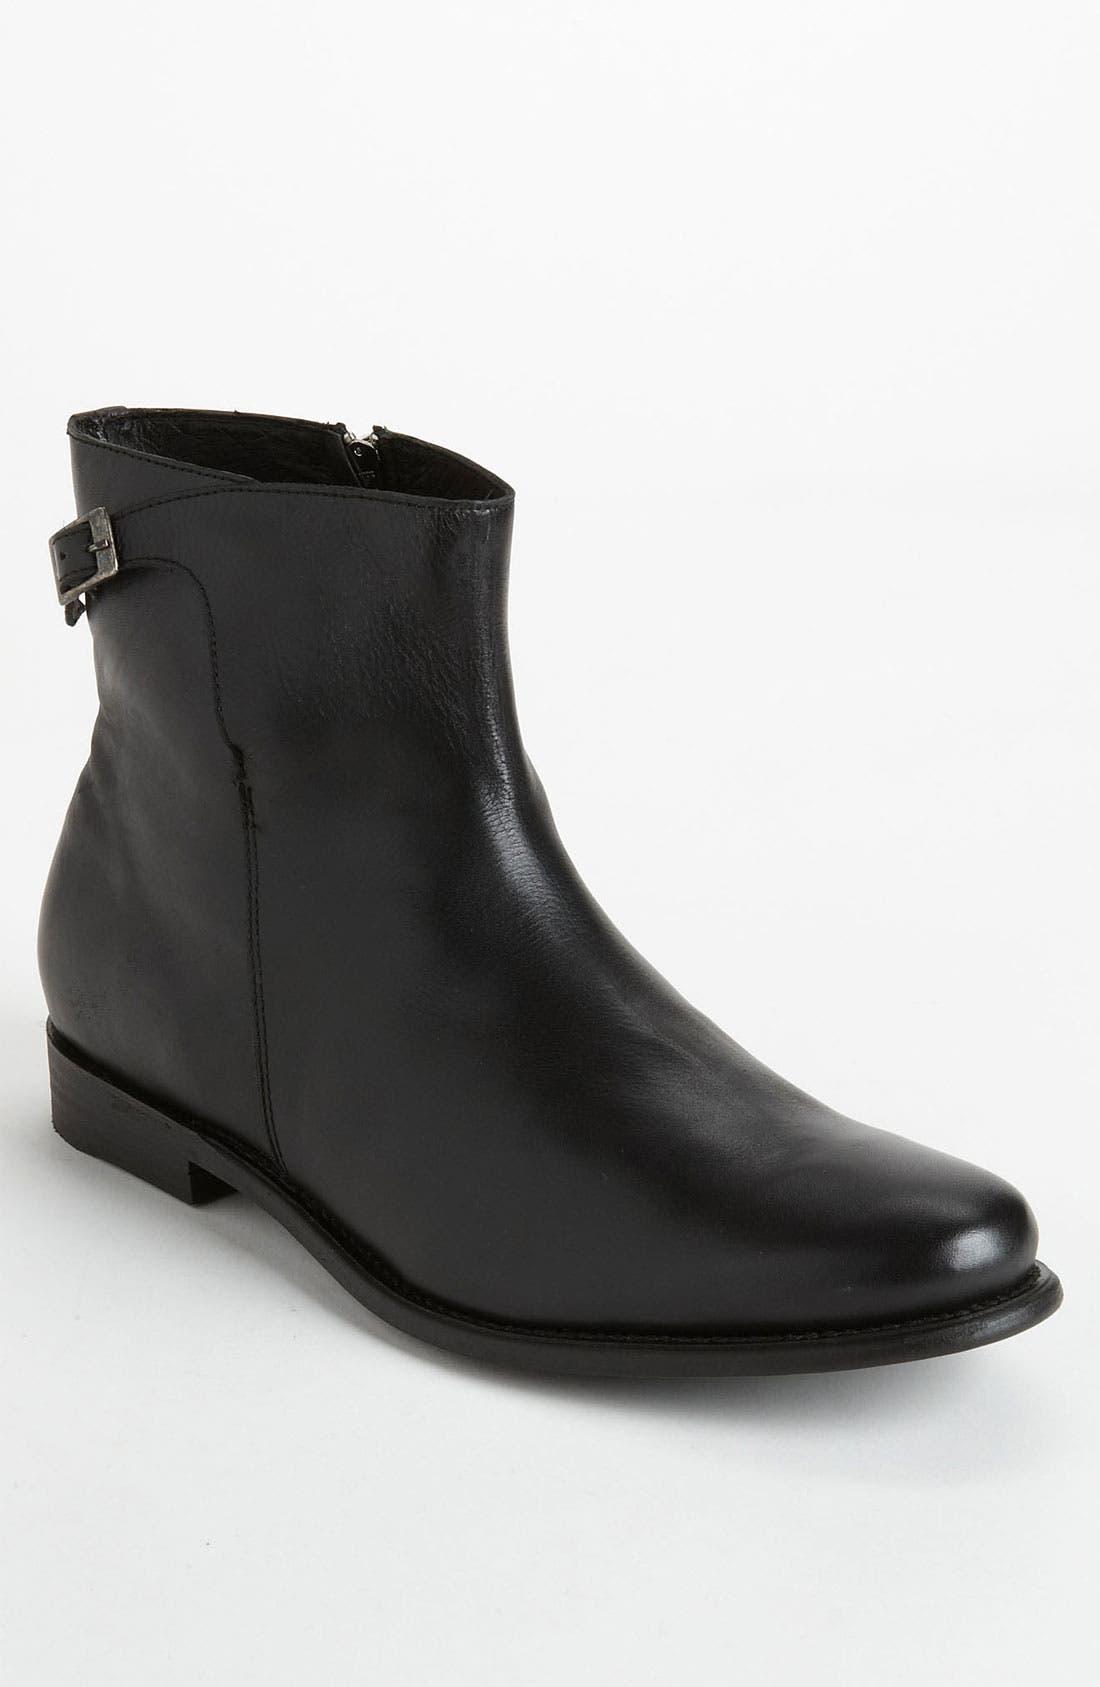 Alternate Image 1 Selected - J.D. Fisk 'Franky' Plain Toe Boot (Online Only)